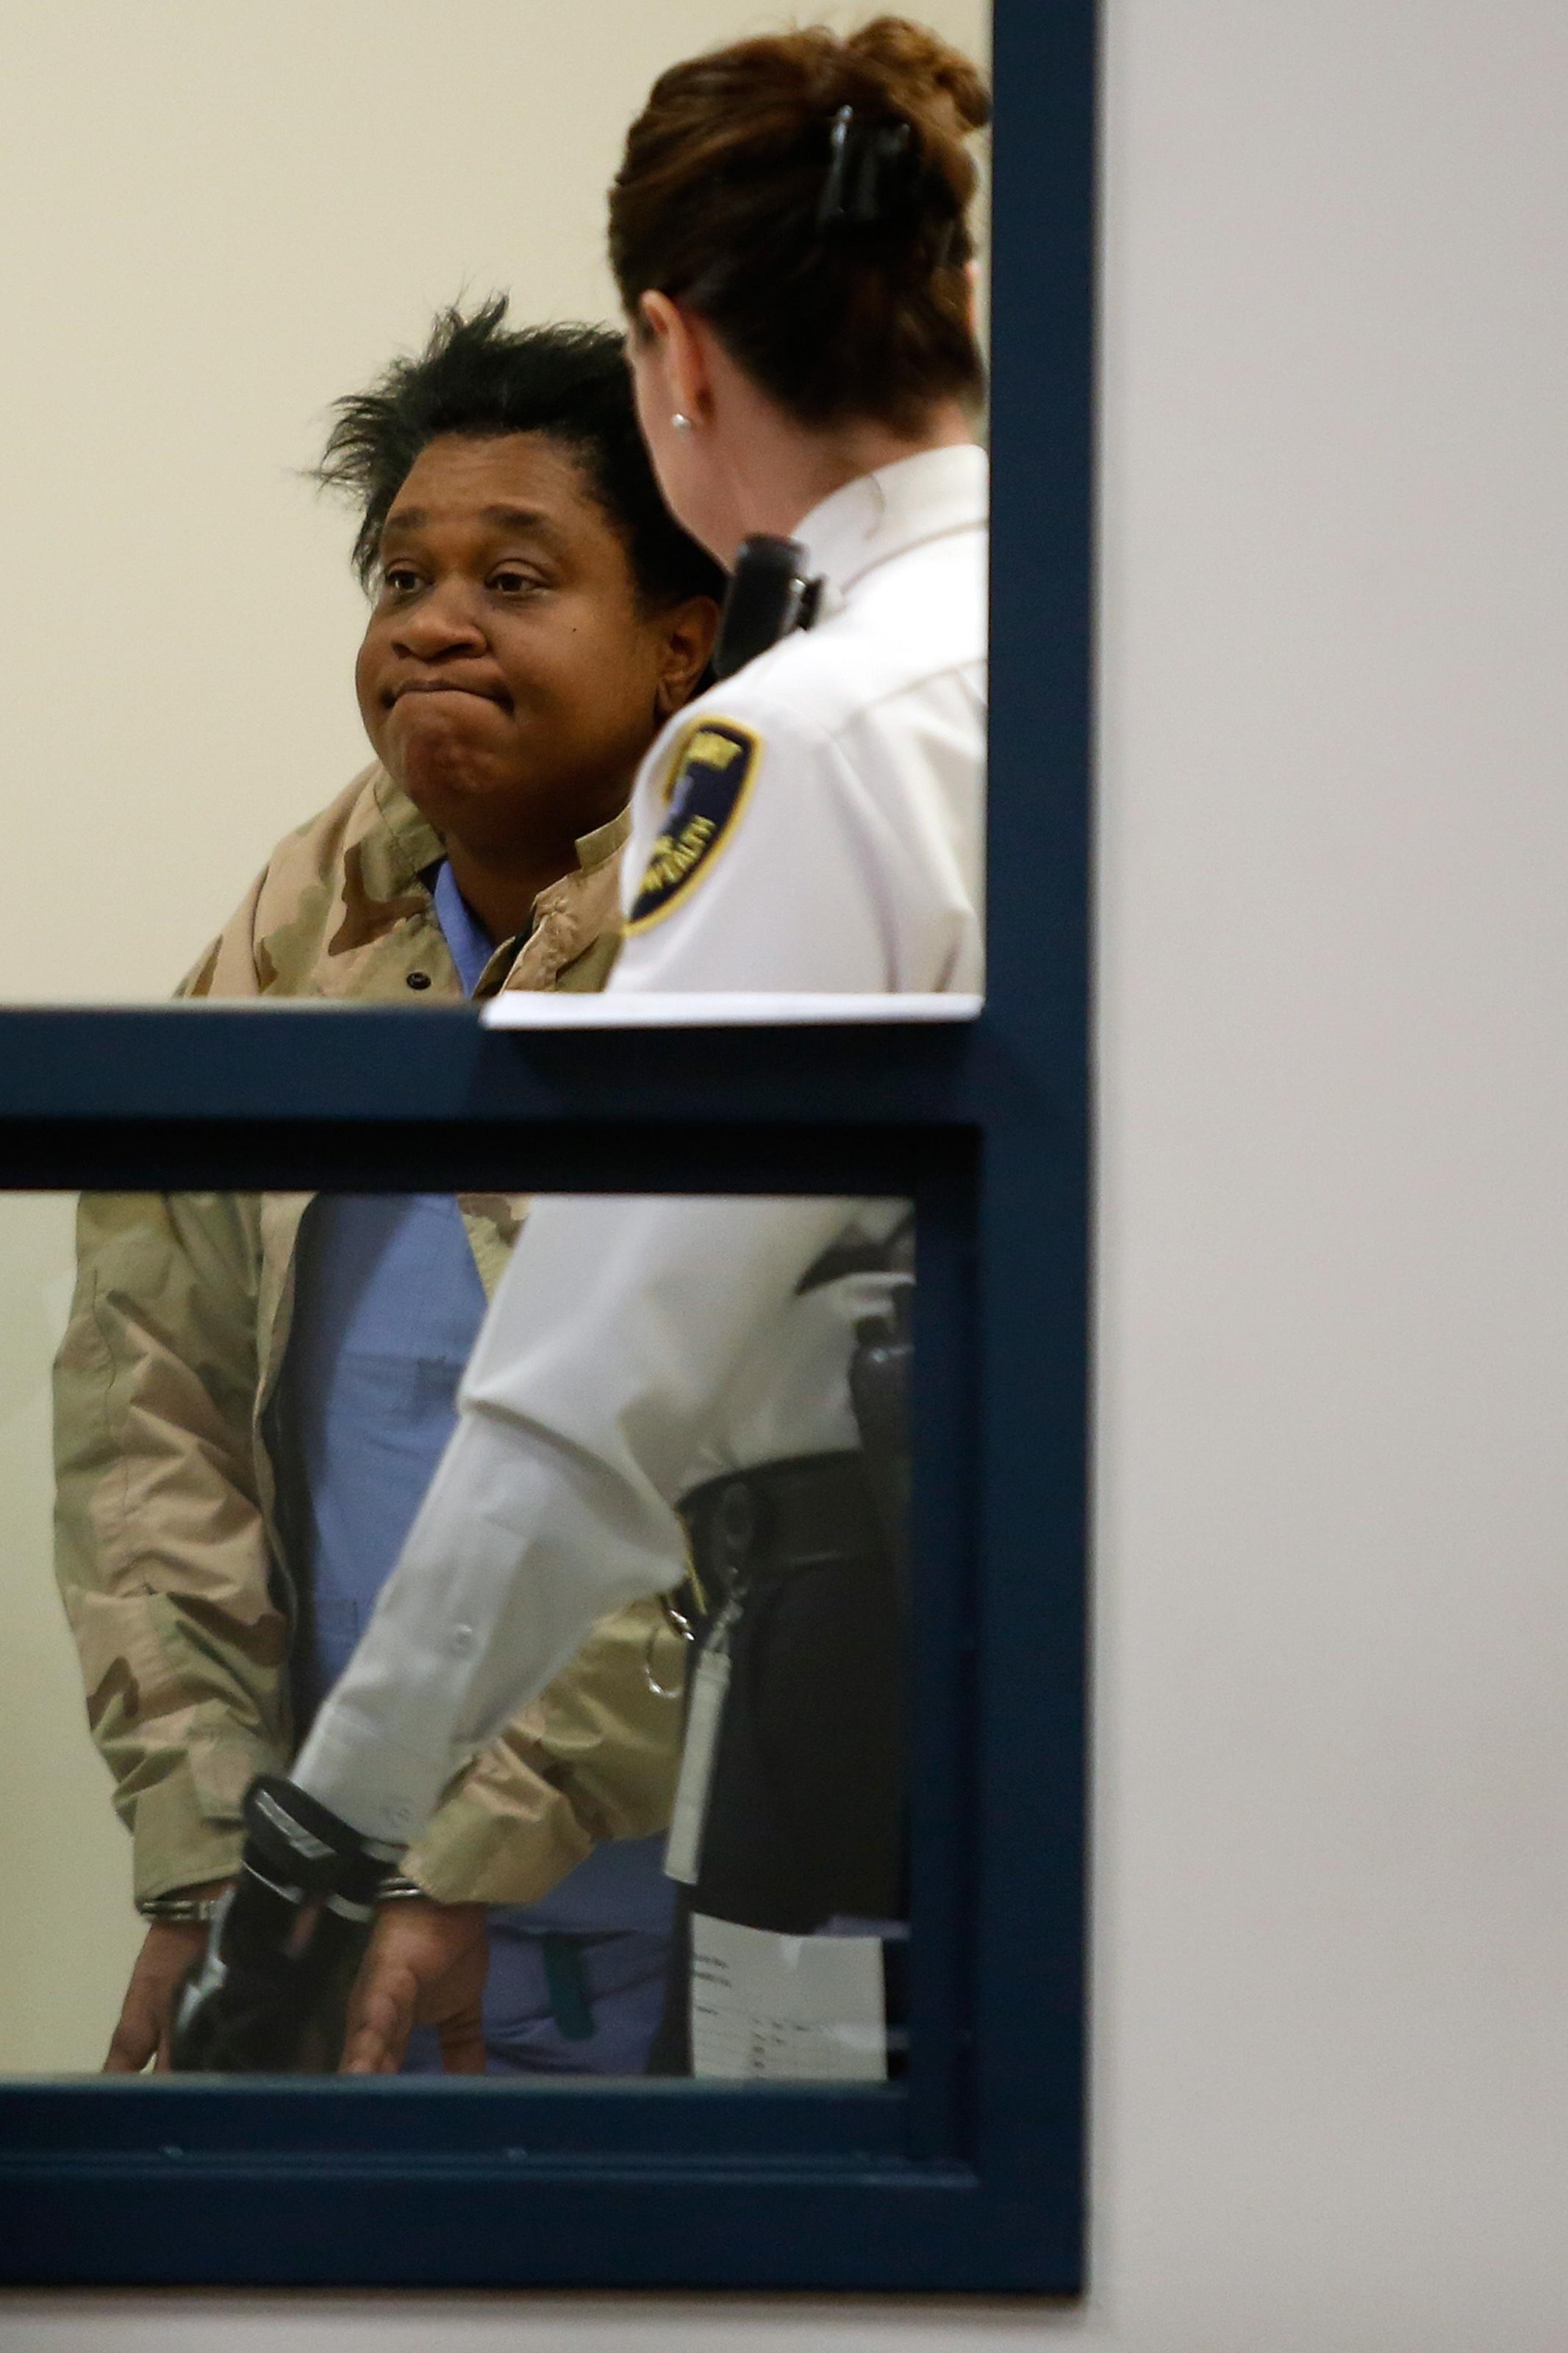 Cambridge woman charged in stabbing - The Boston Globe